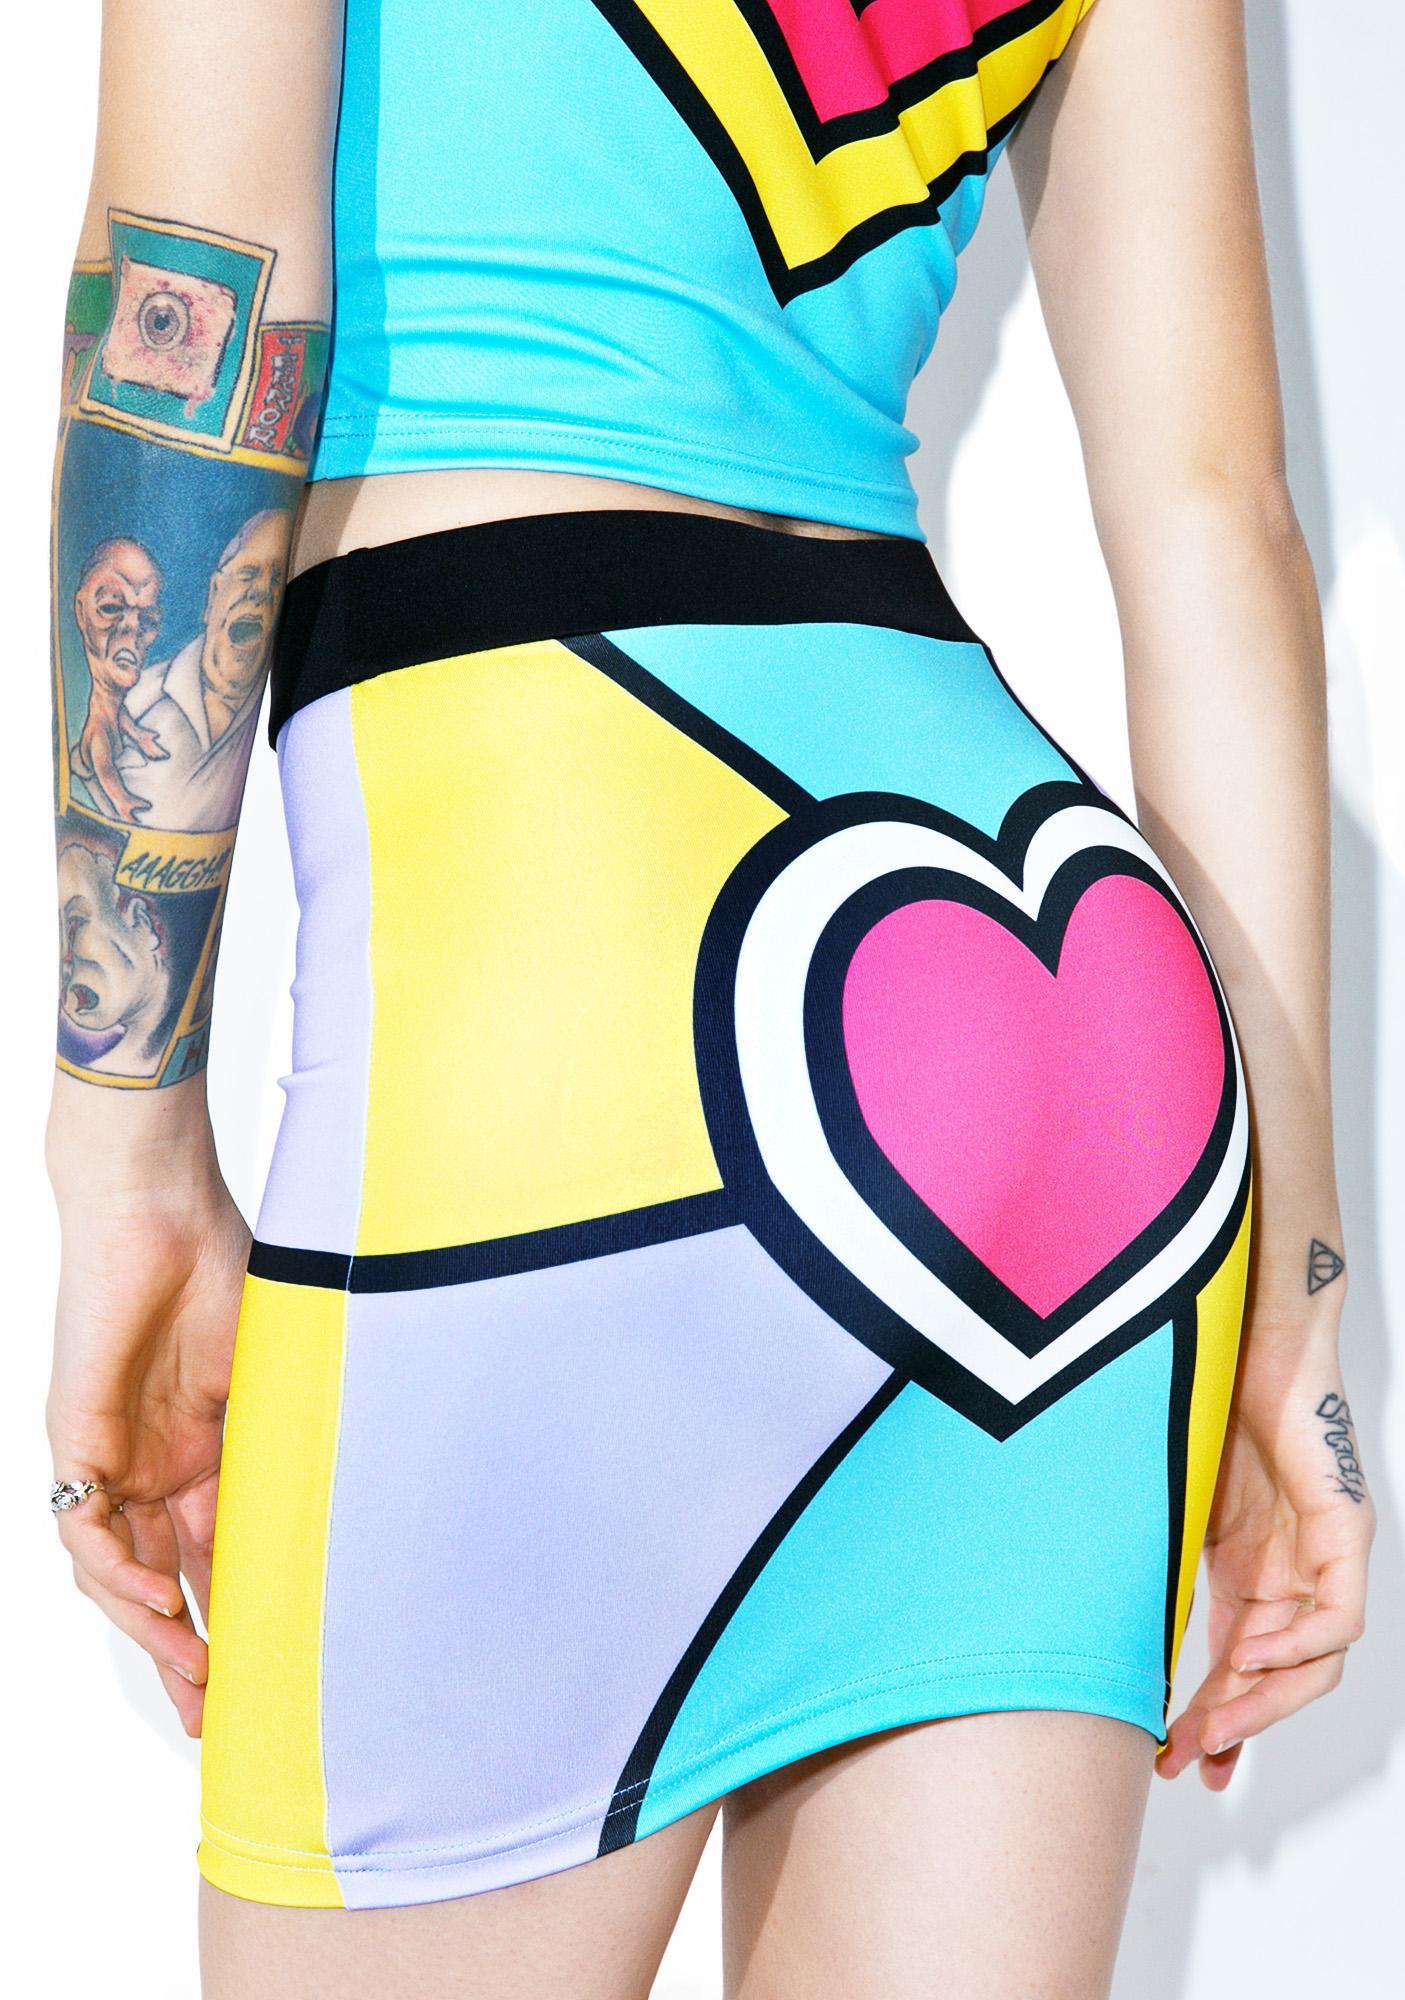 Nympha Electric Love Mini Skirt